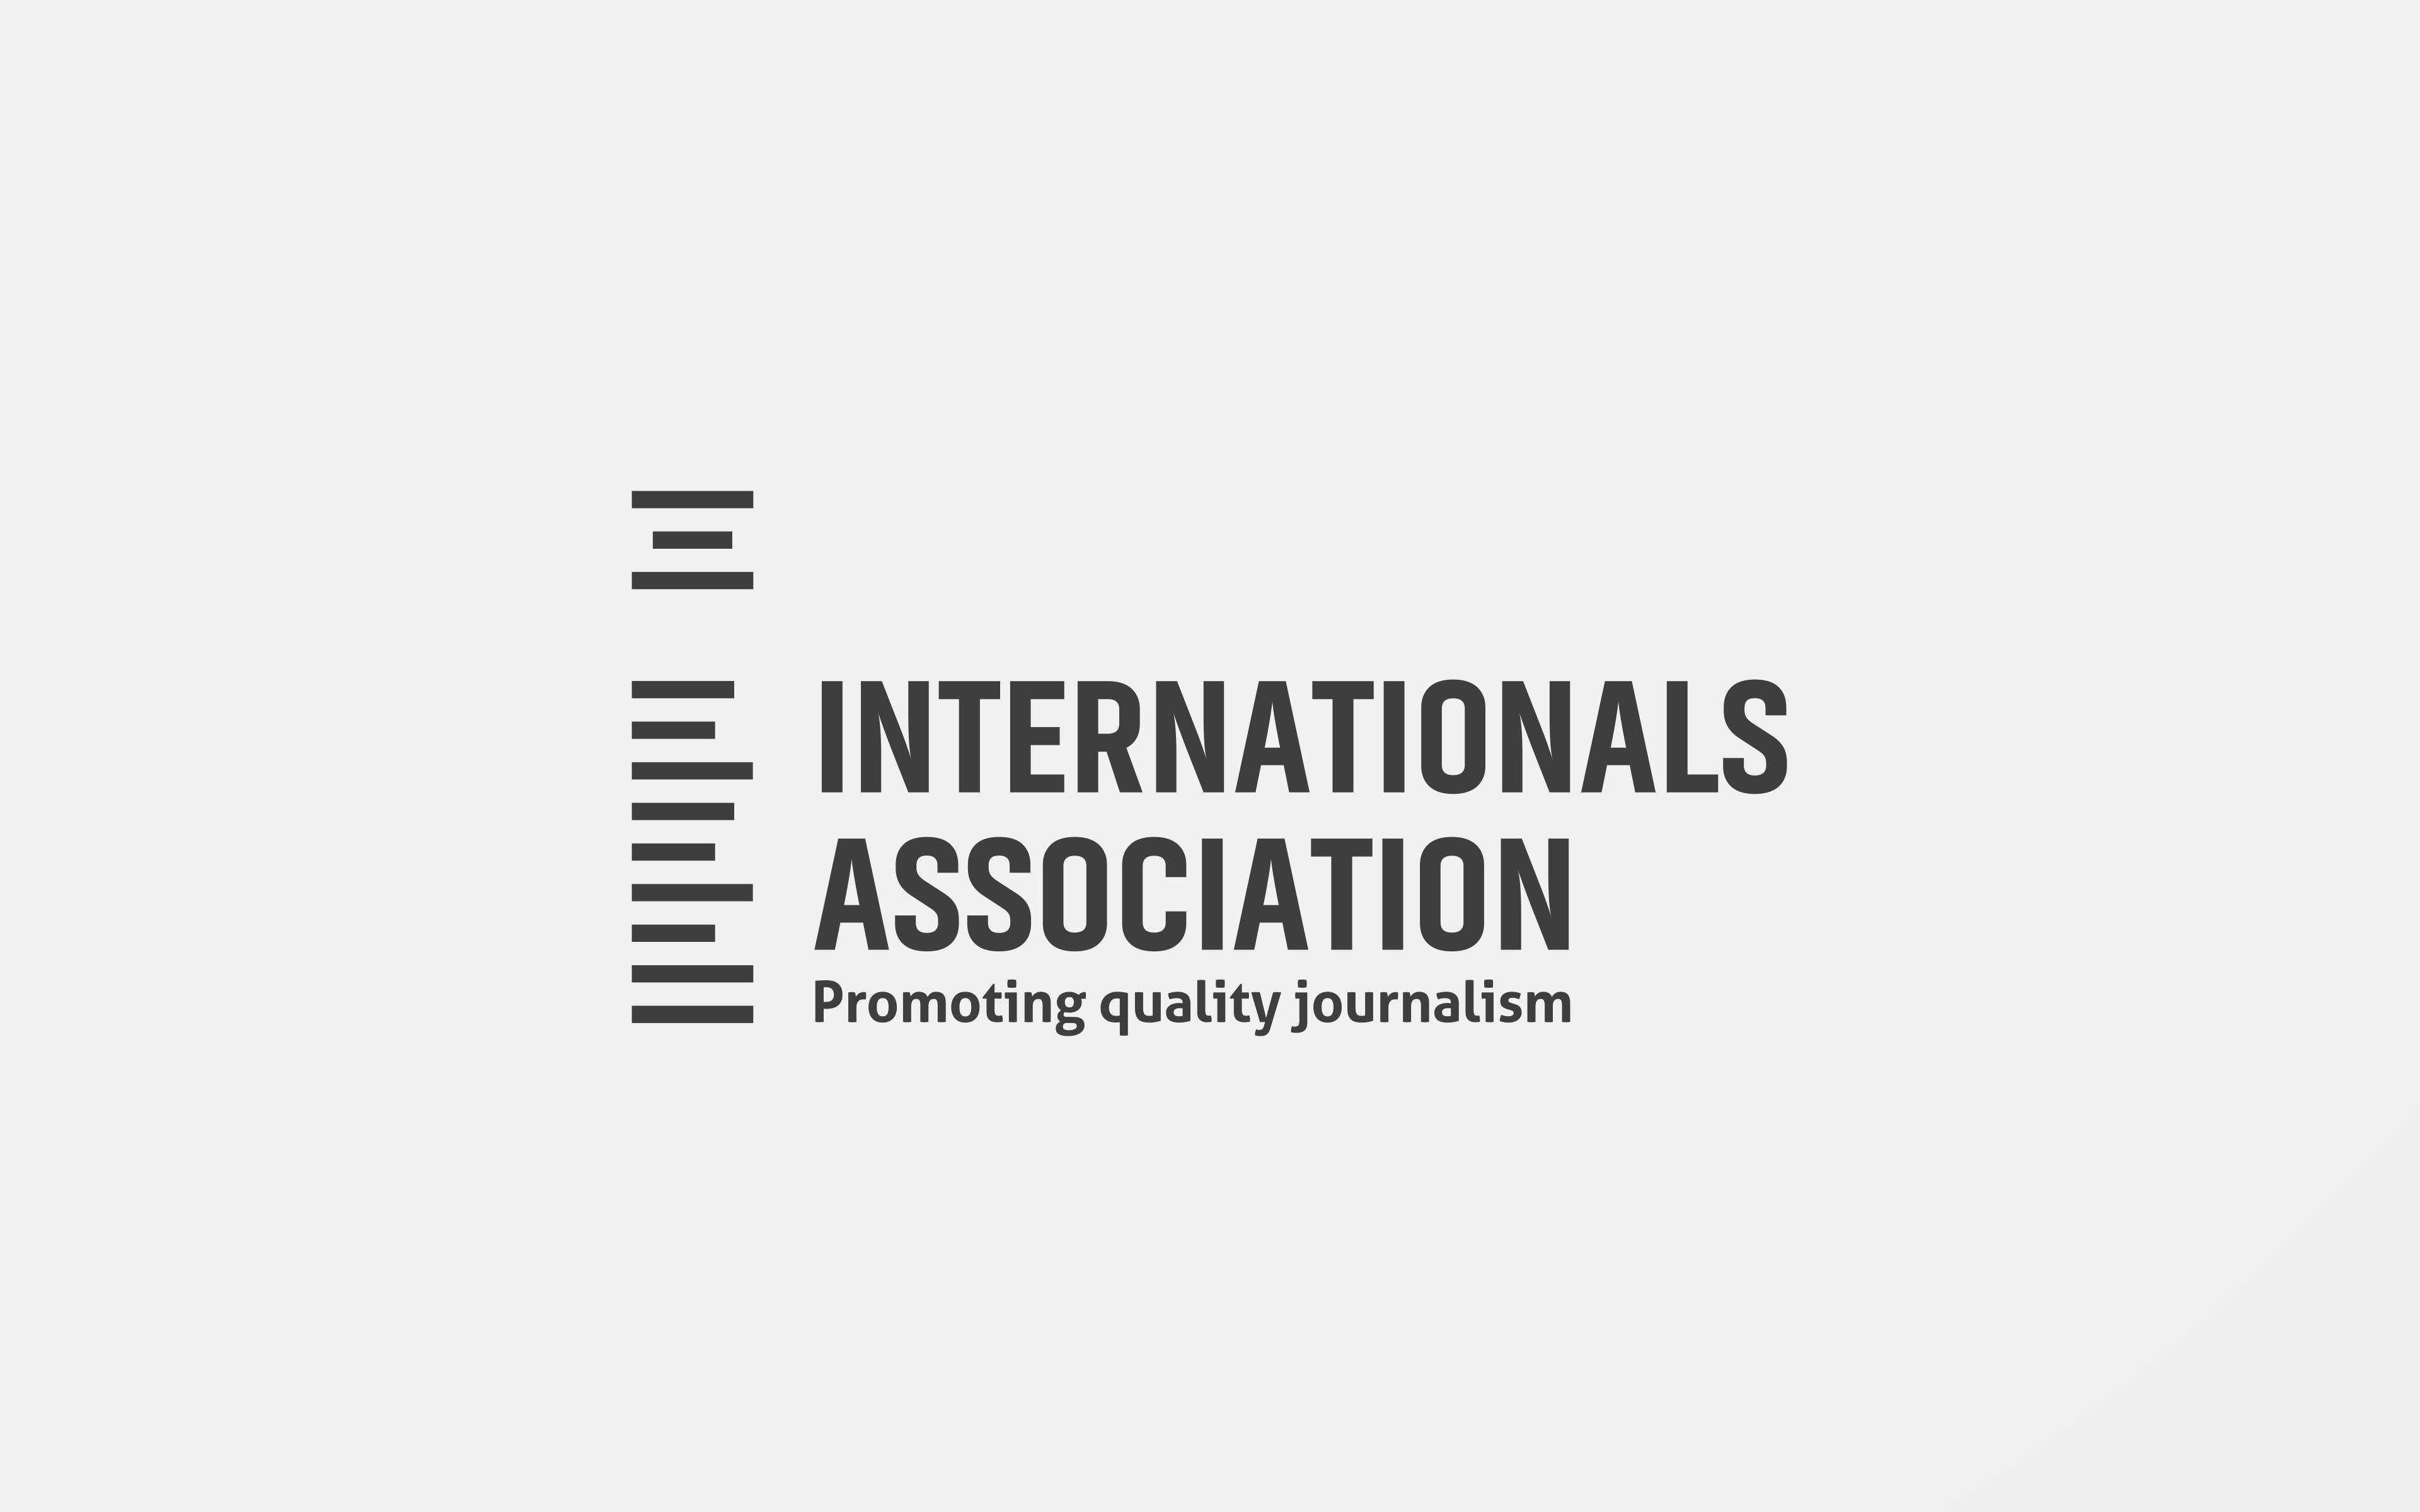 Internationals Association